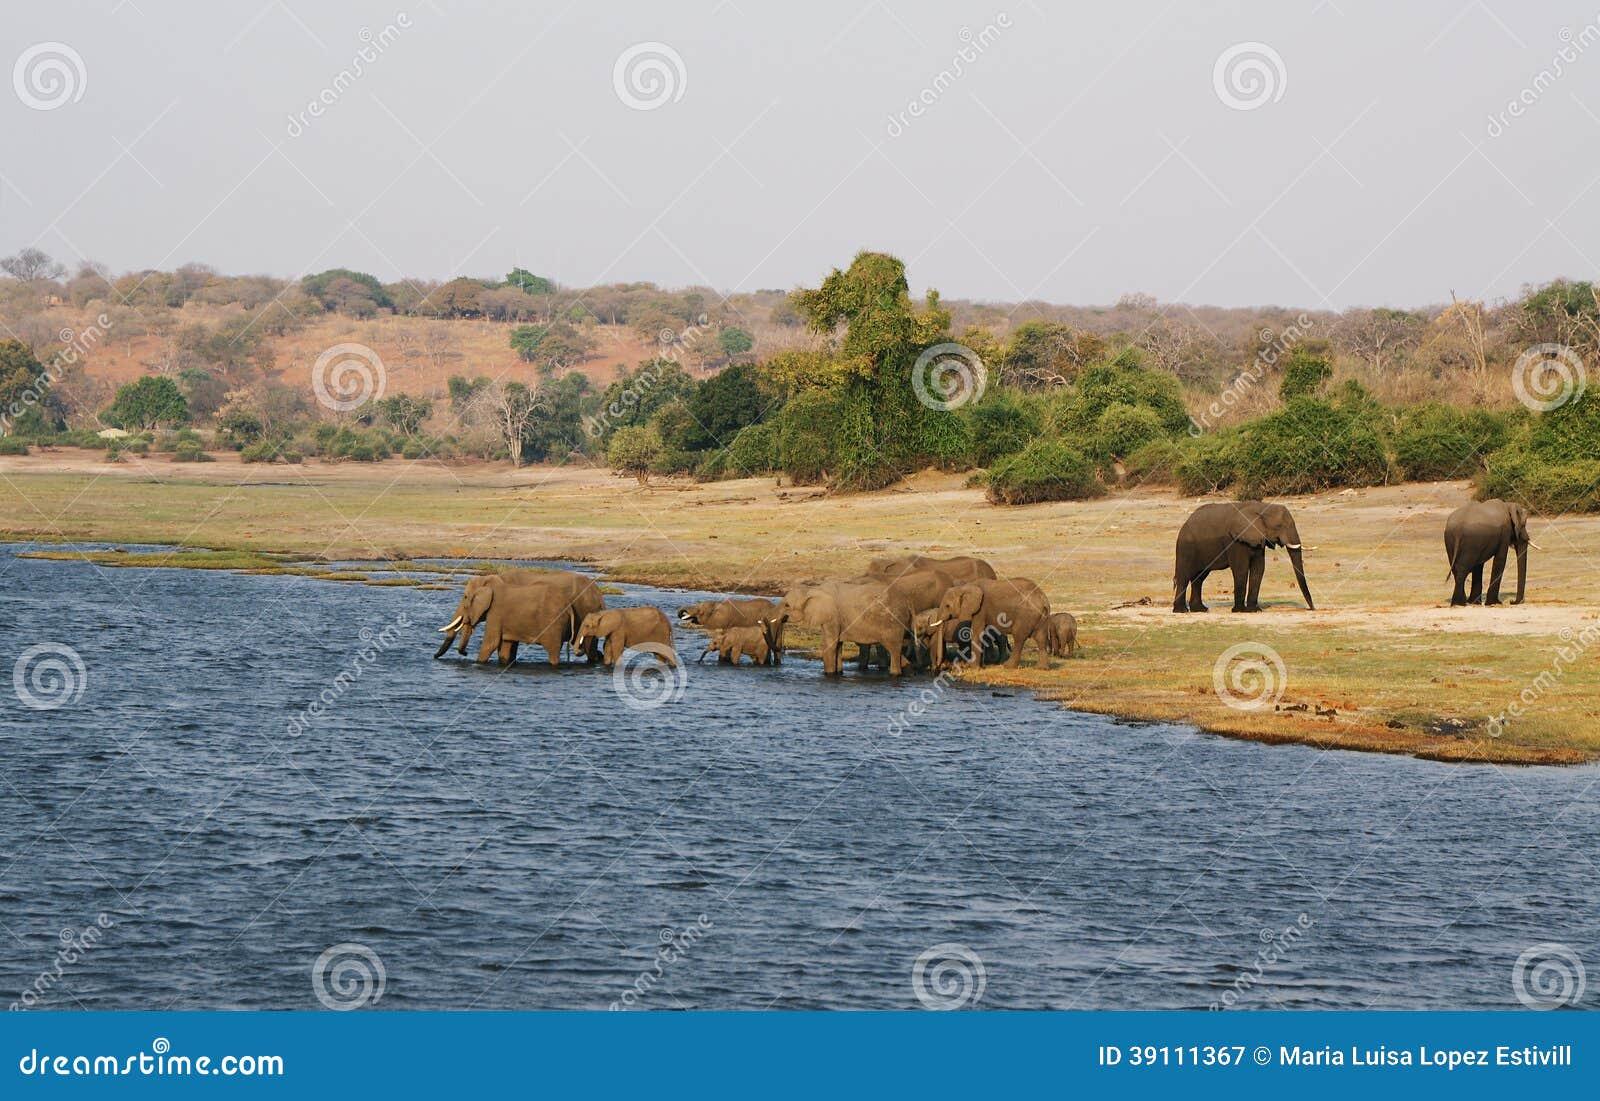 Olifantenfamilie in Chobe riverfront